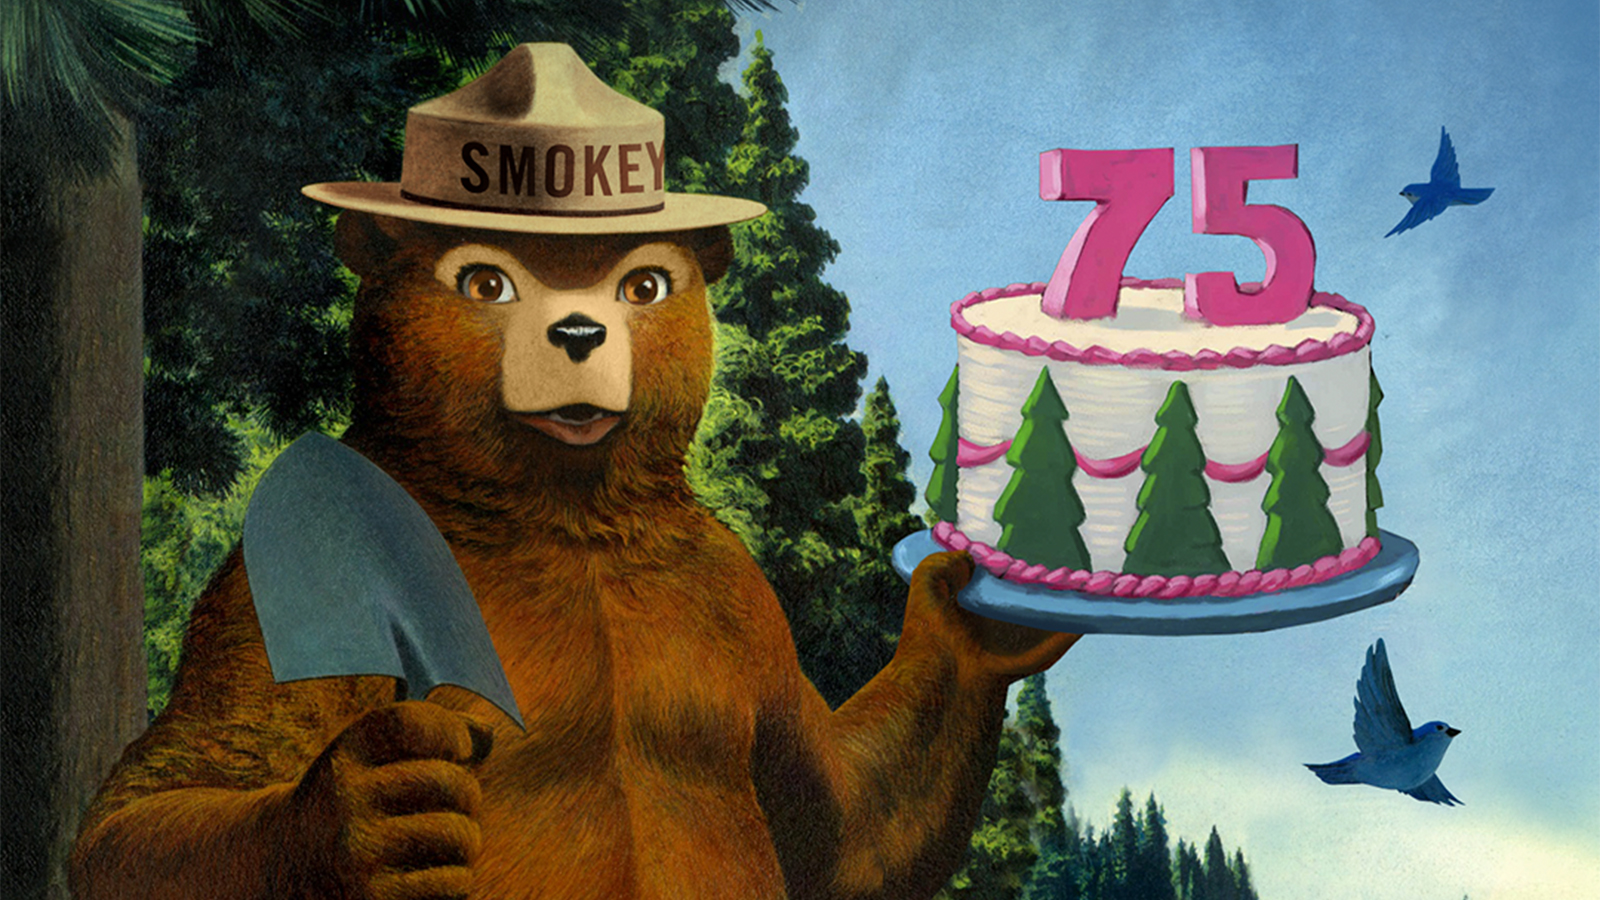 DEC to celebrate Smokey Bear's 75th